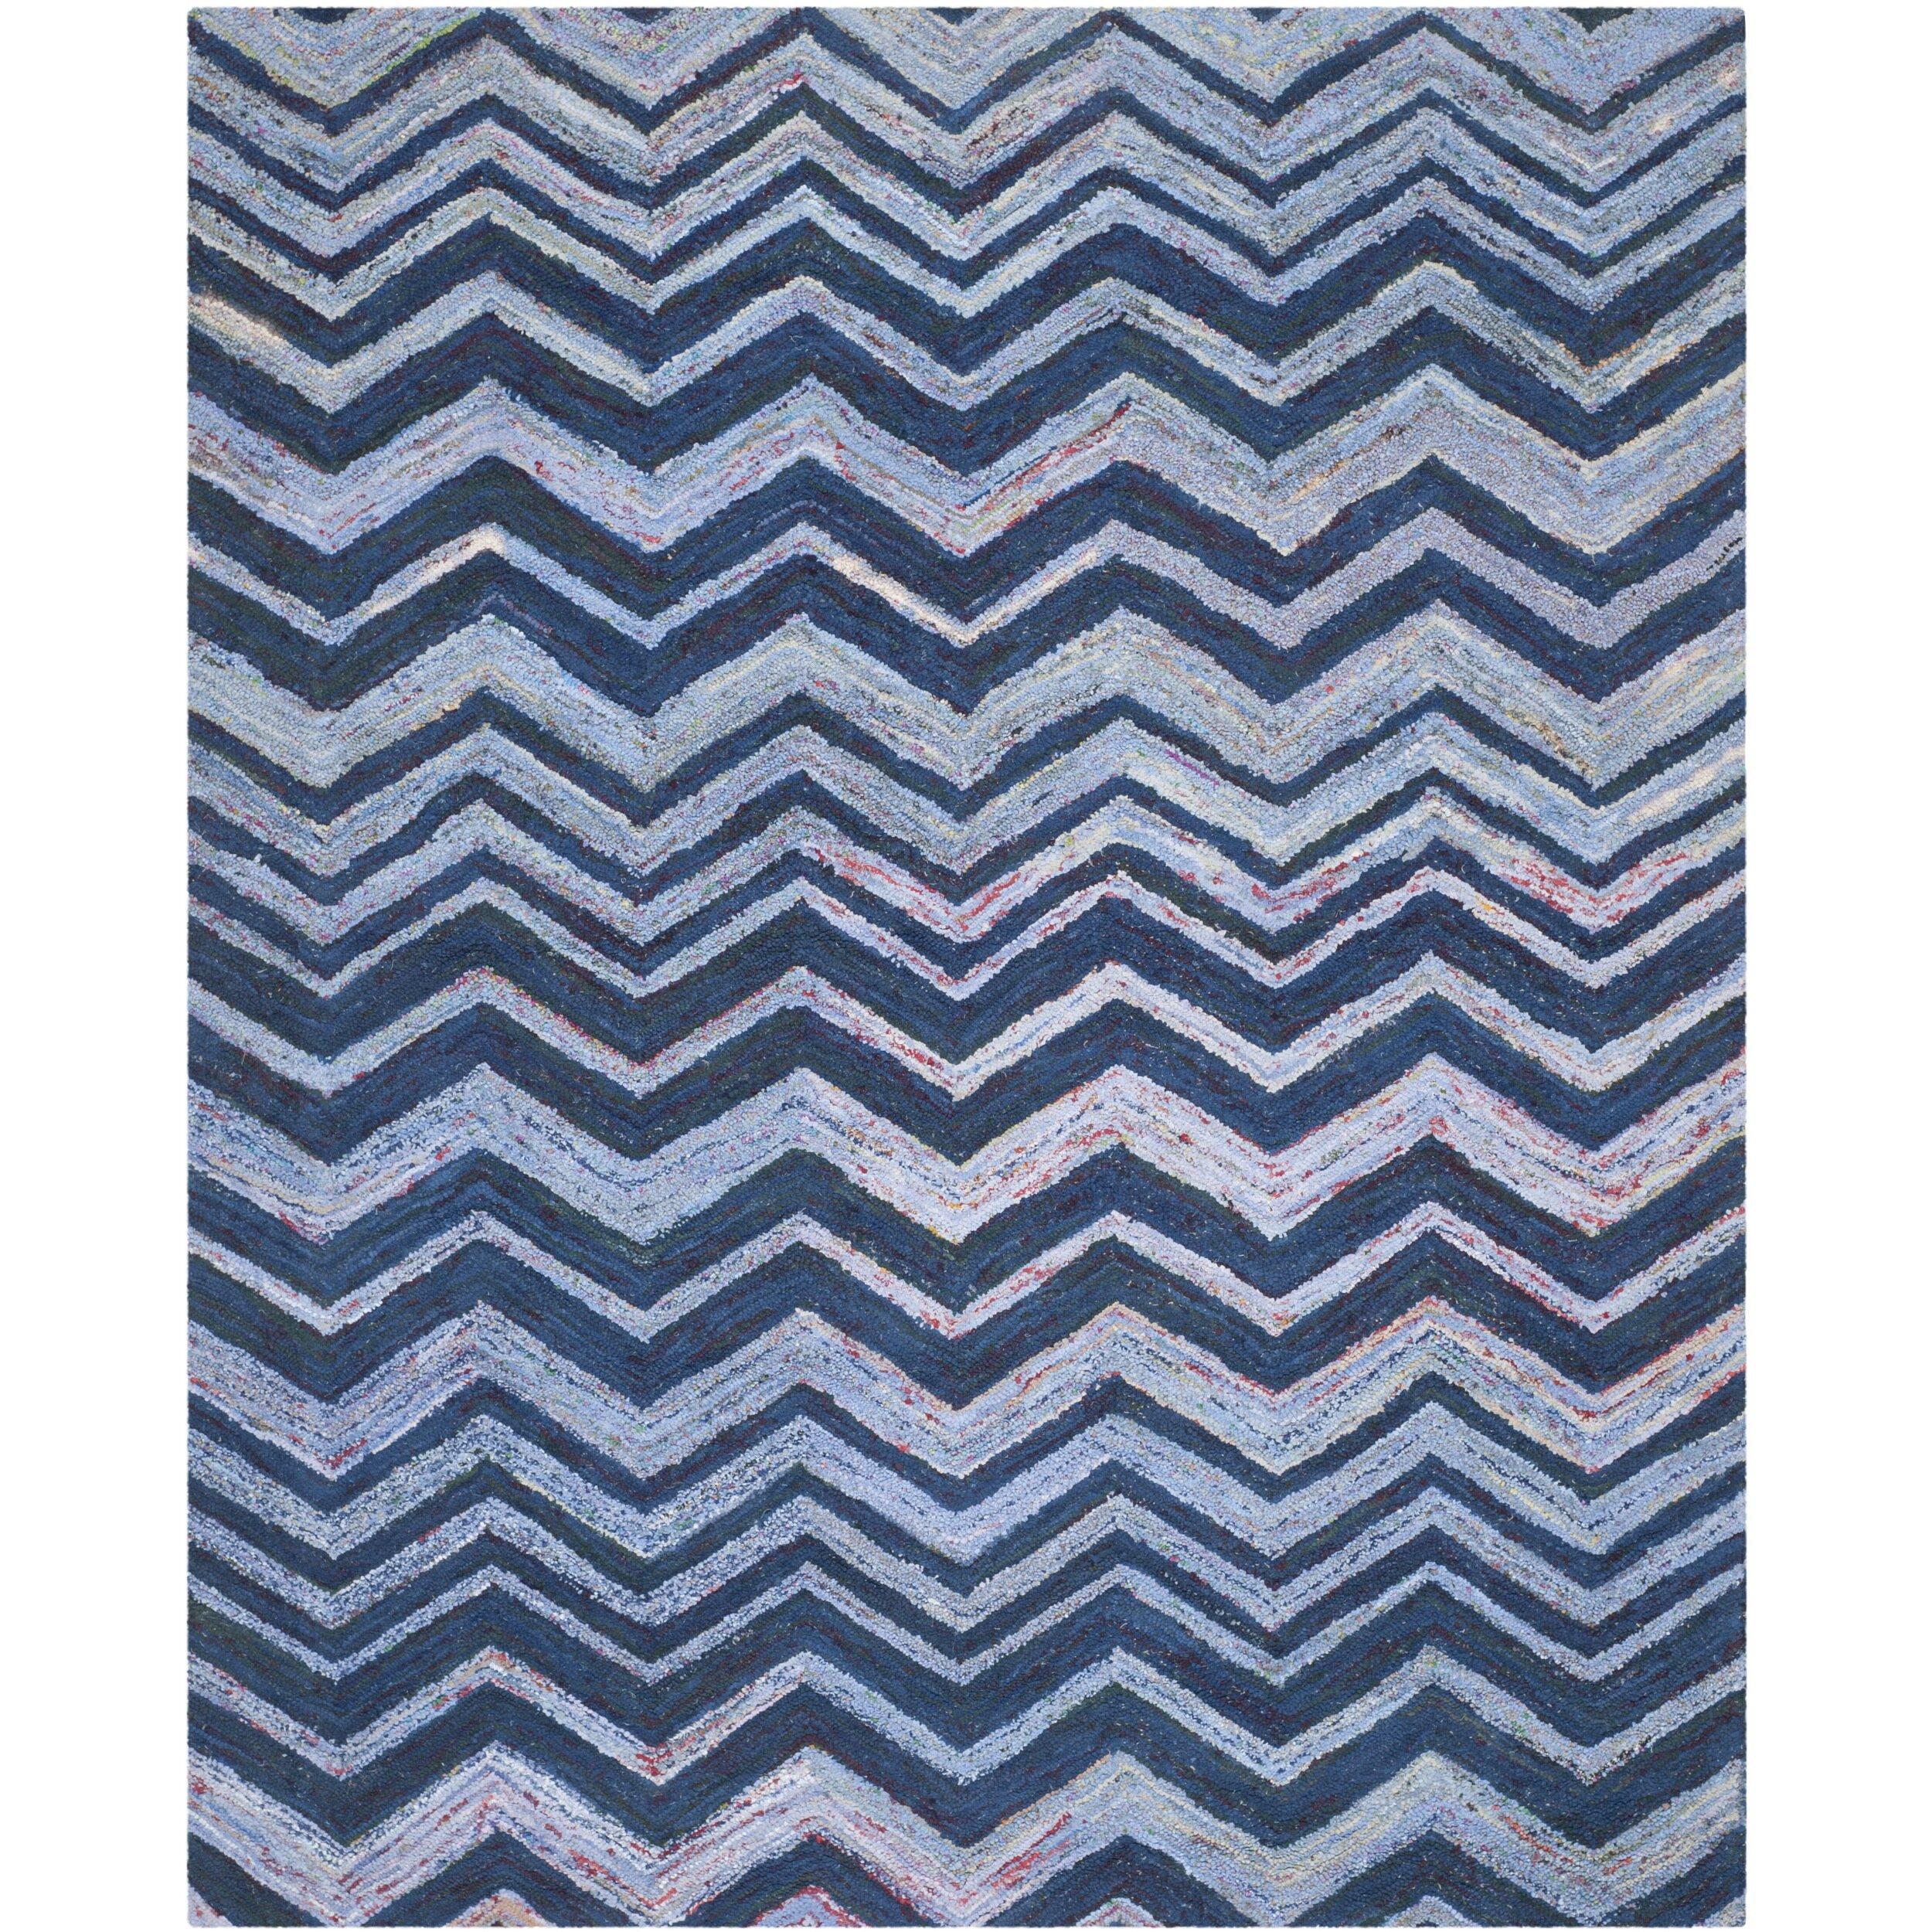 blue chevron rug - blue chevron rug roselawnlutheran